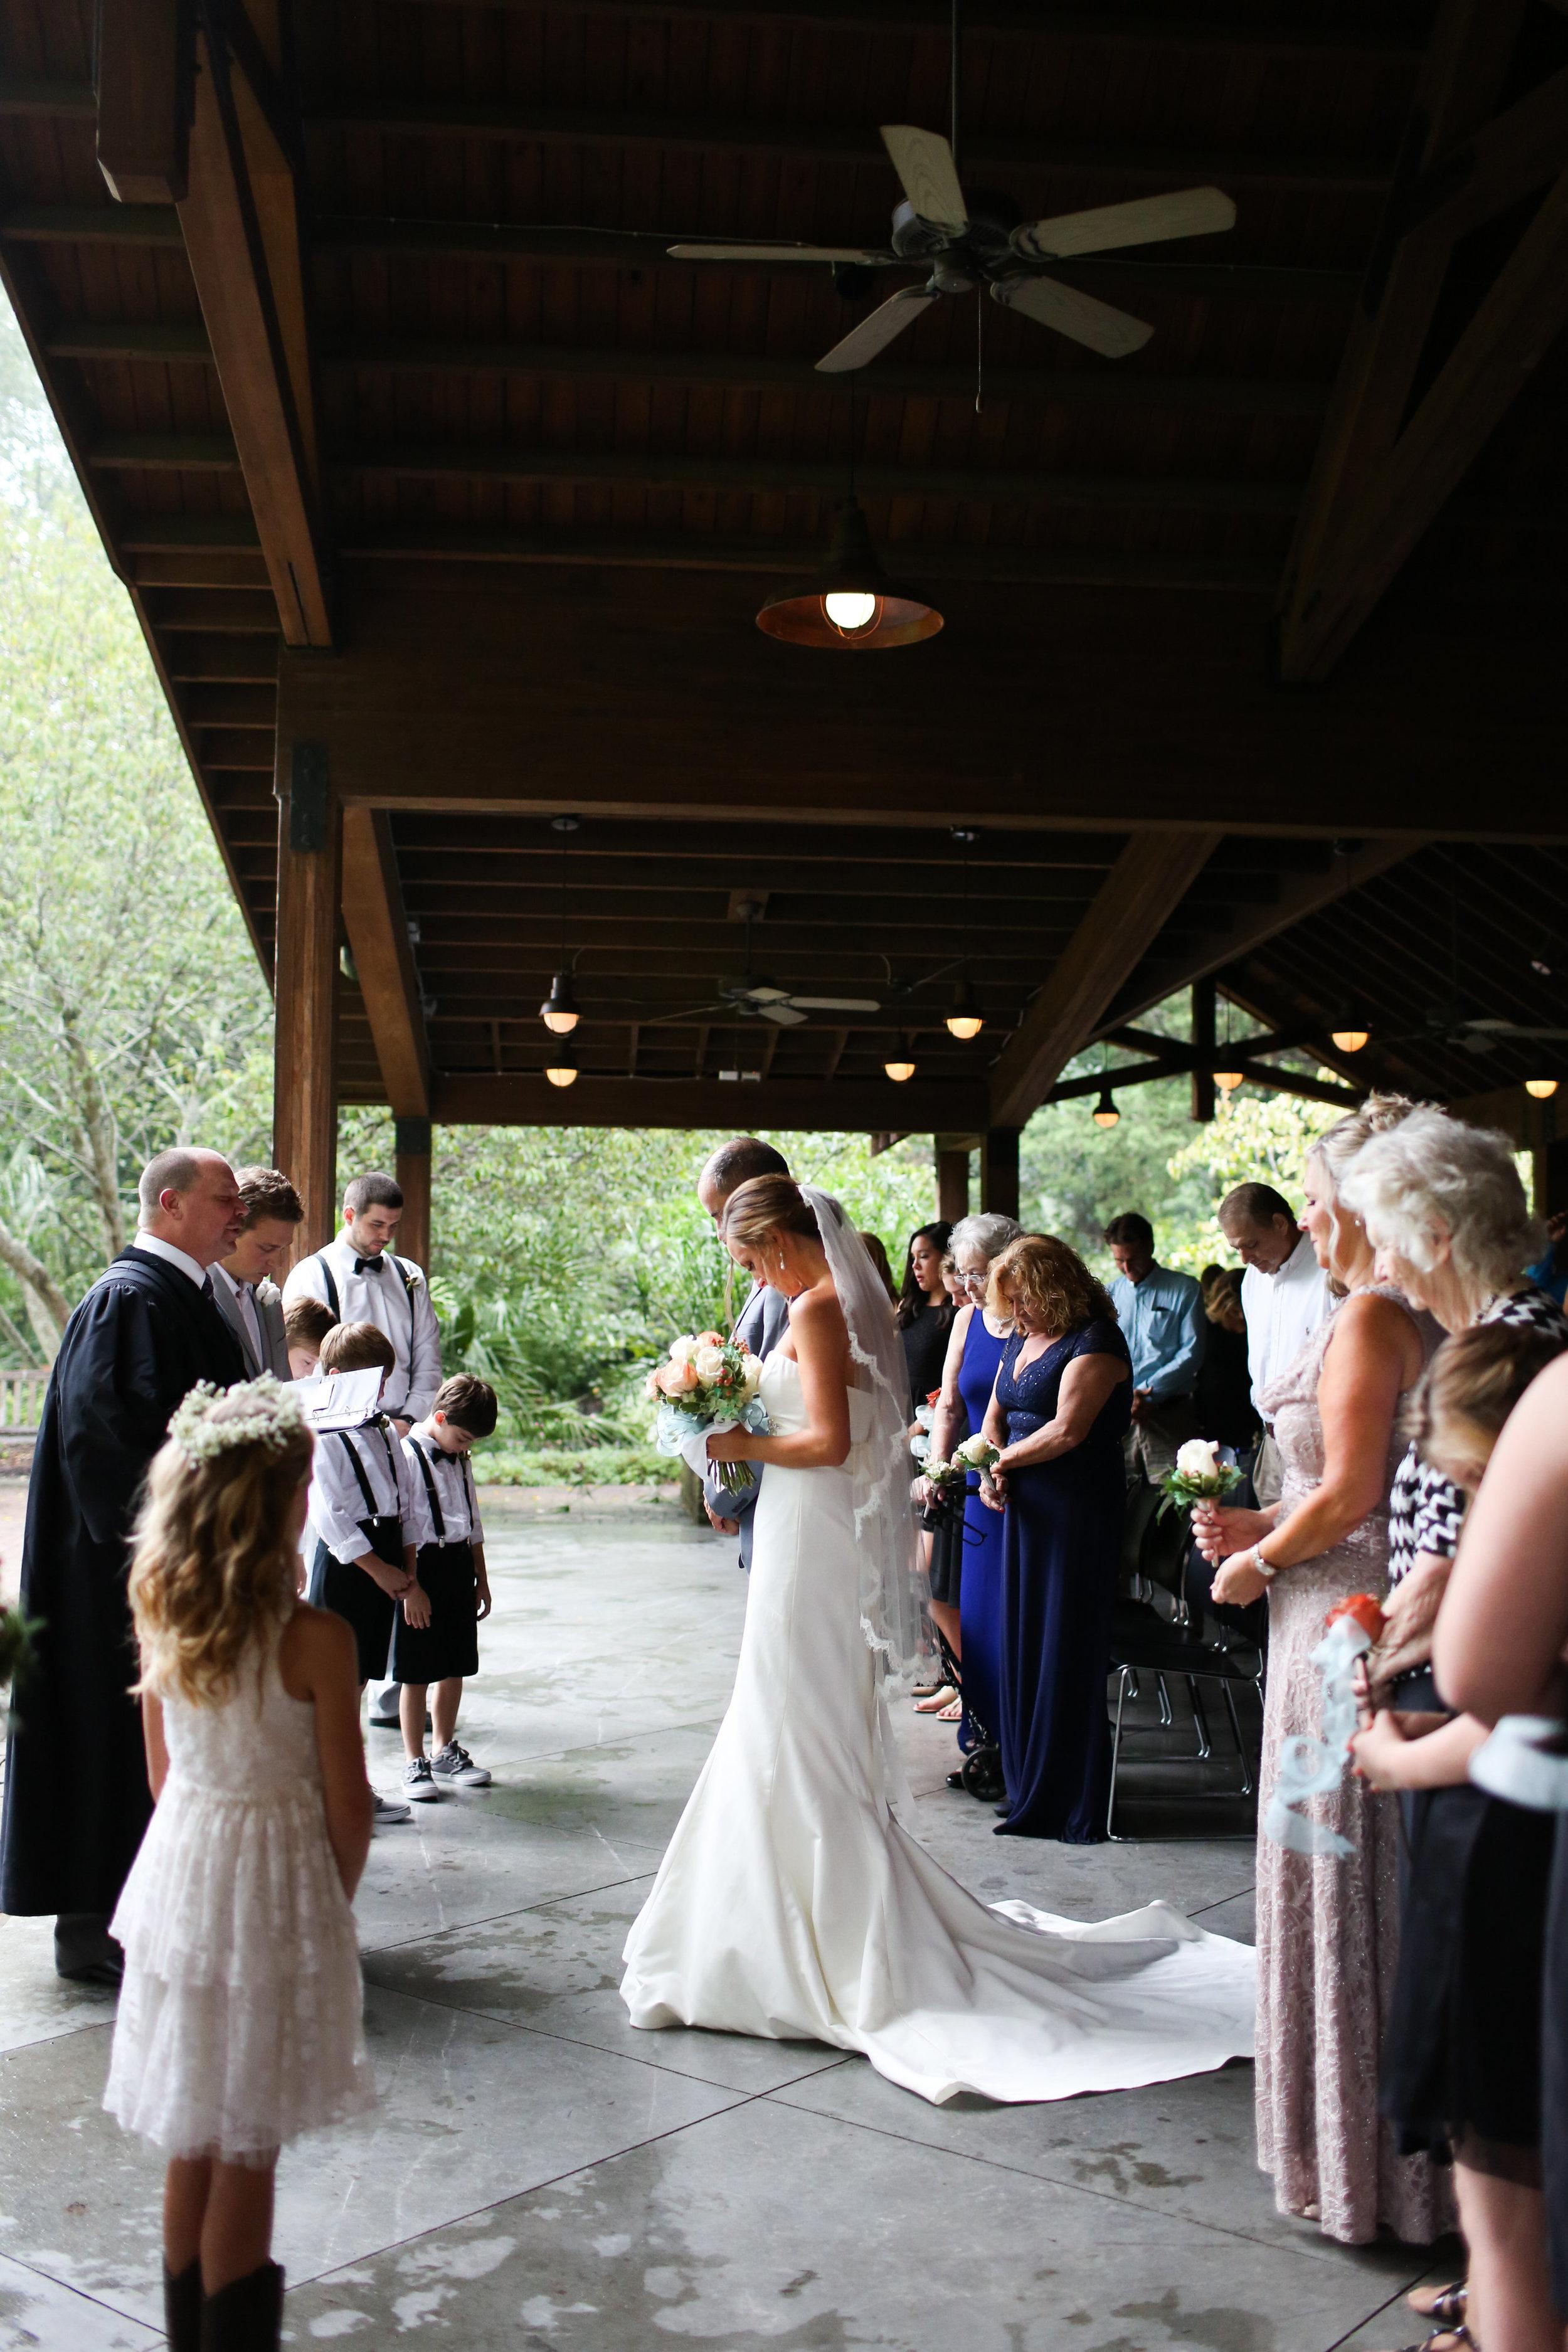 finnegan-photography-ivory-and-beau-bridal-boutique-nicole-miller-dakota-jaclyn-jordan-anne-veil-savannah-bridal-boutique-savannah-wedding-dresses-savannah-weddings-statesboro-wedding-barn-wedding-savannah-bridal-georgia-bridal-boutique-12.jpg